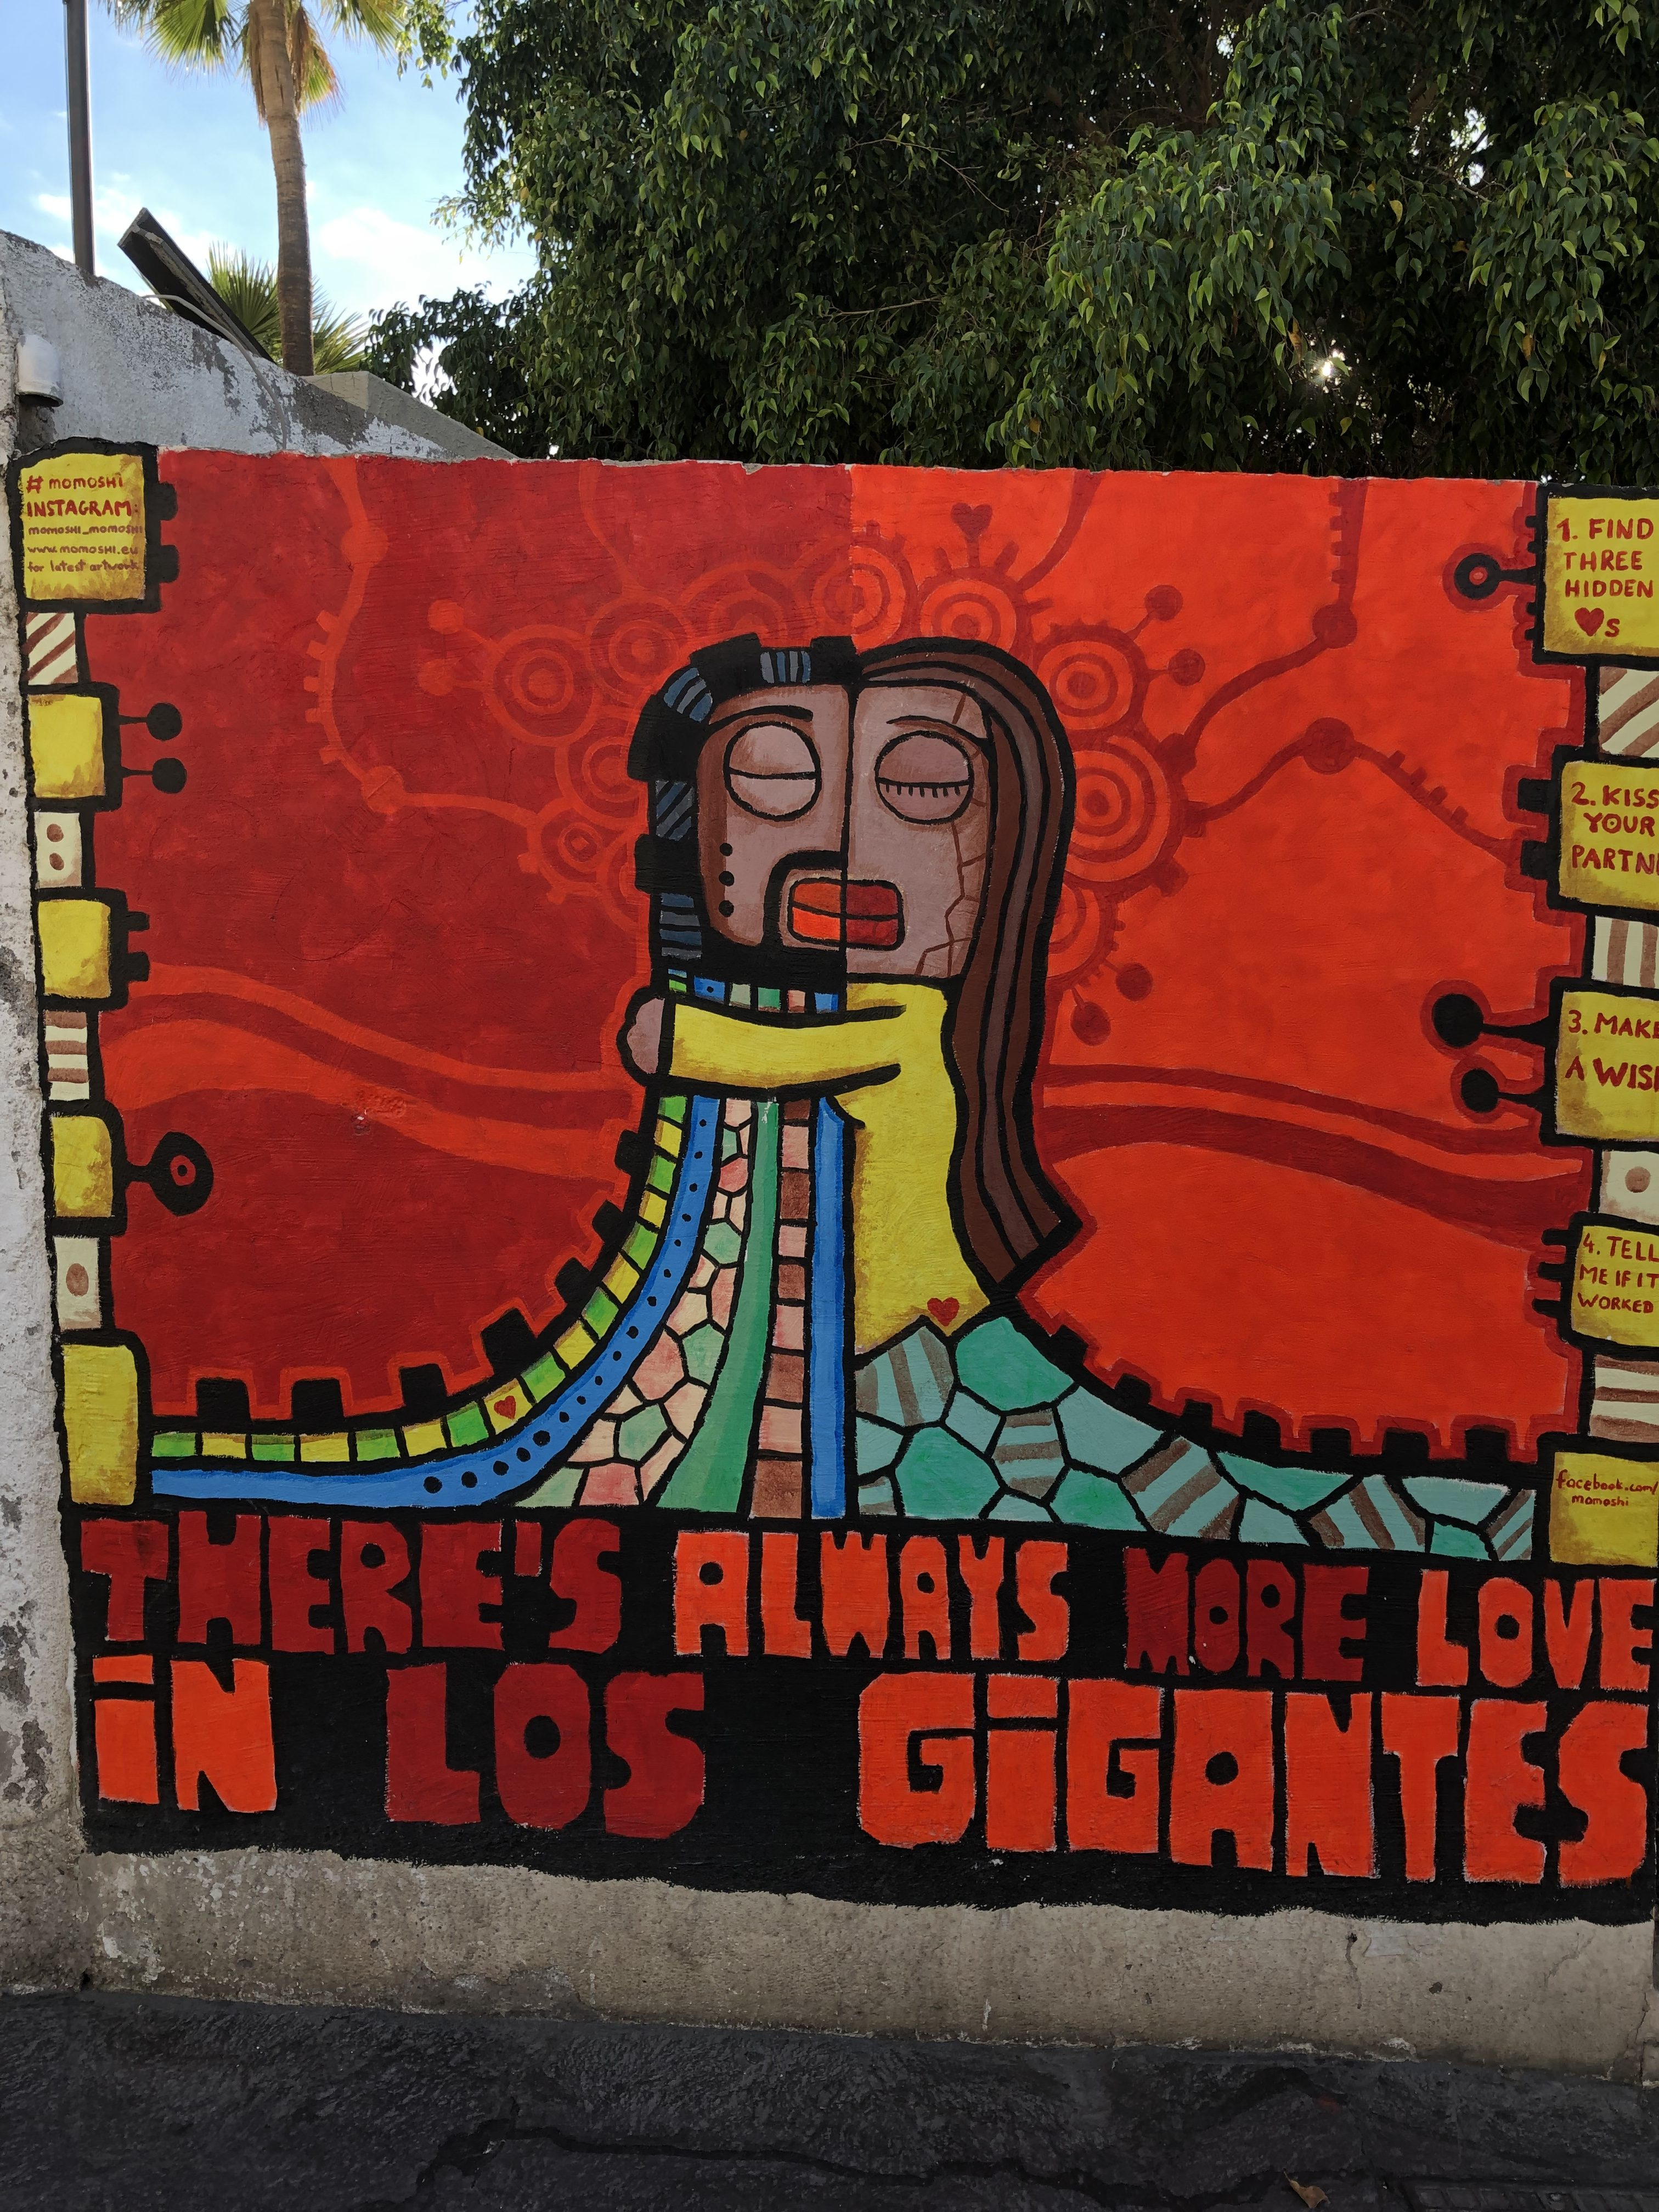 LOS GIGANTES TENERIFFA